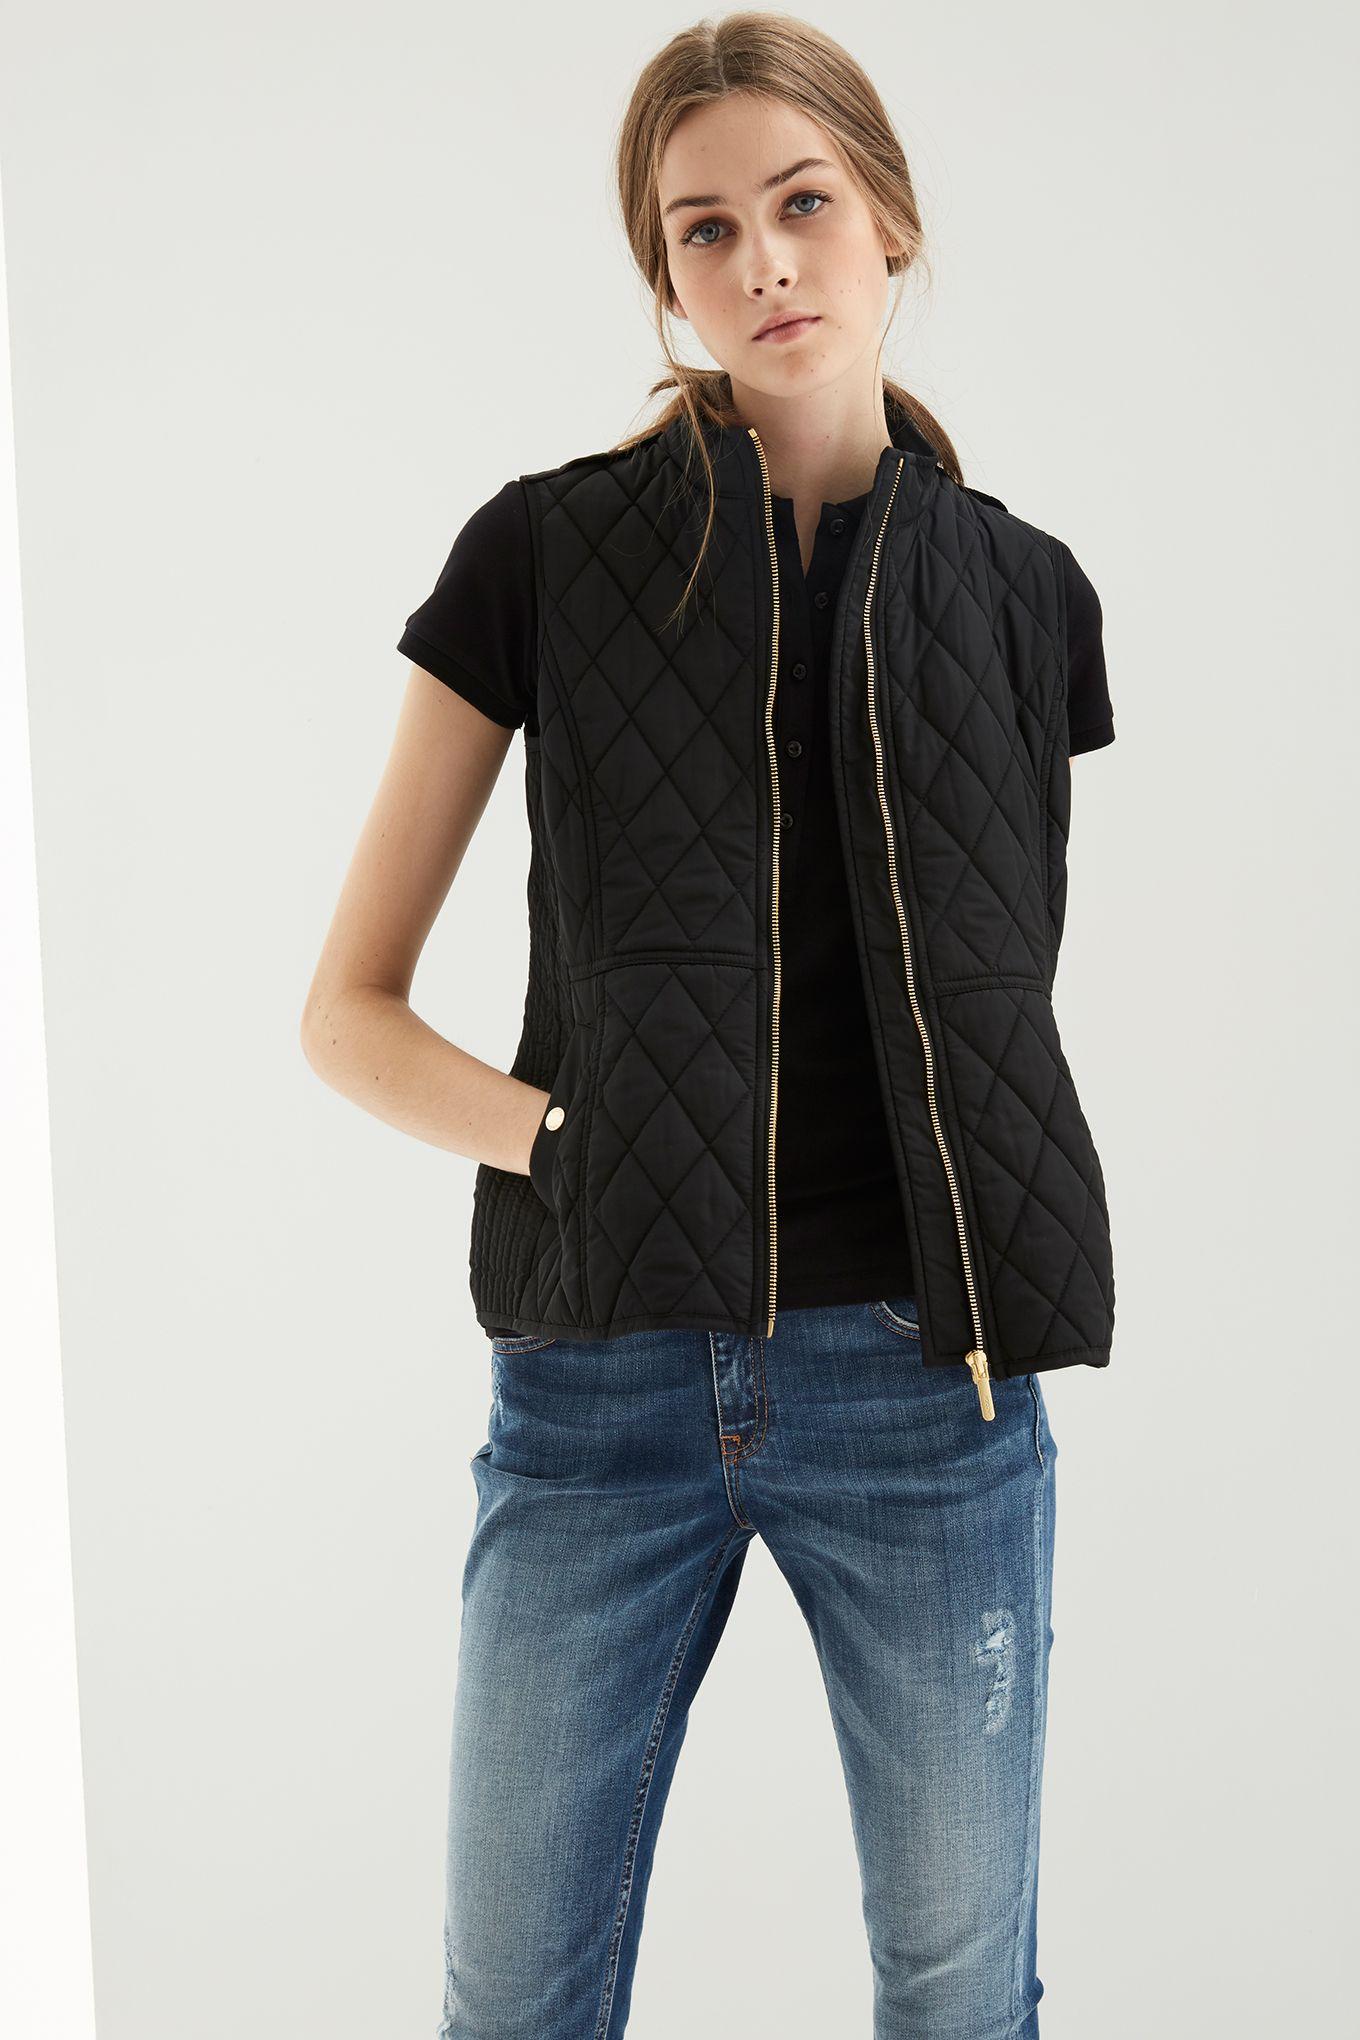 Womens black casual vest